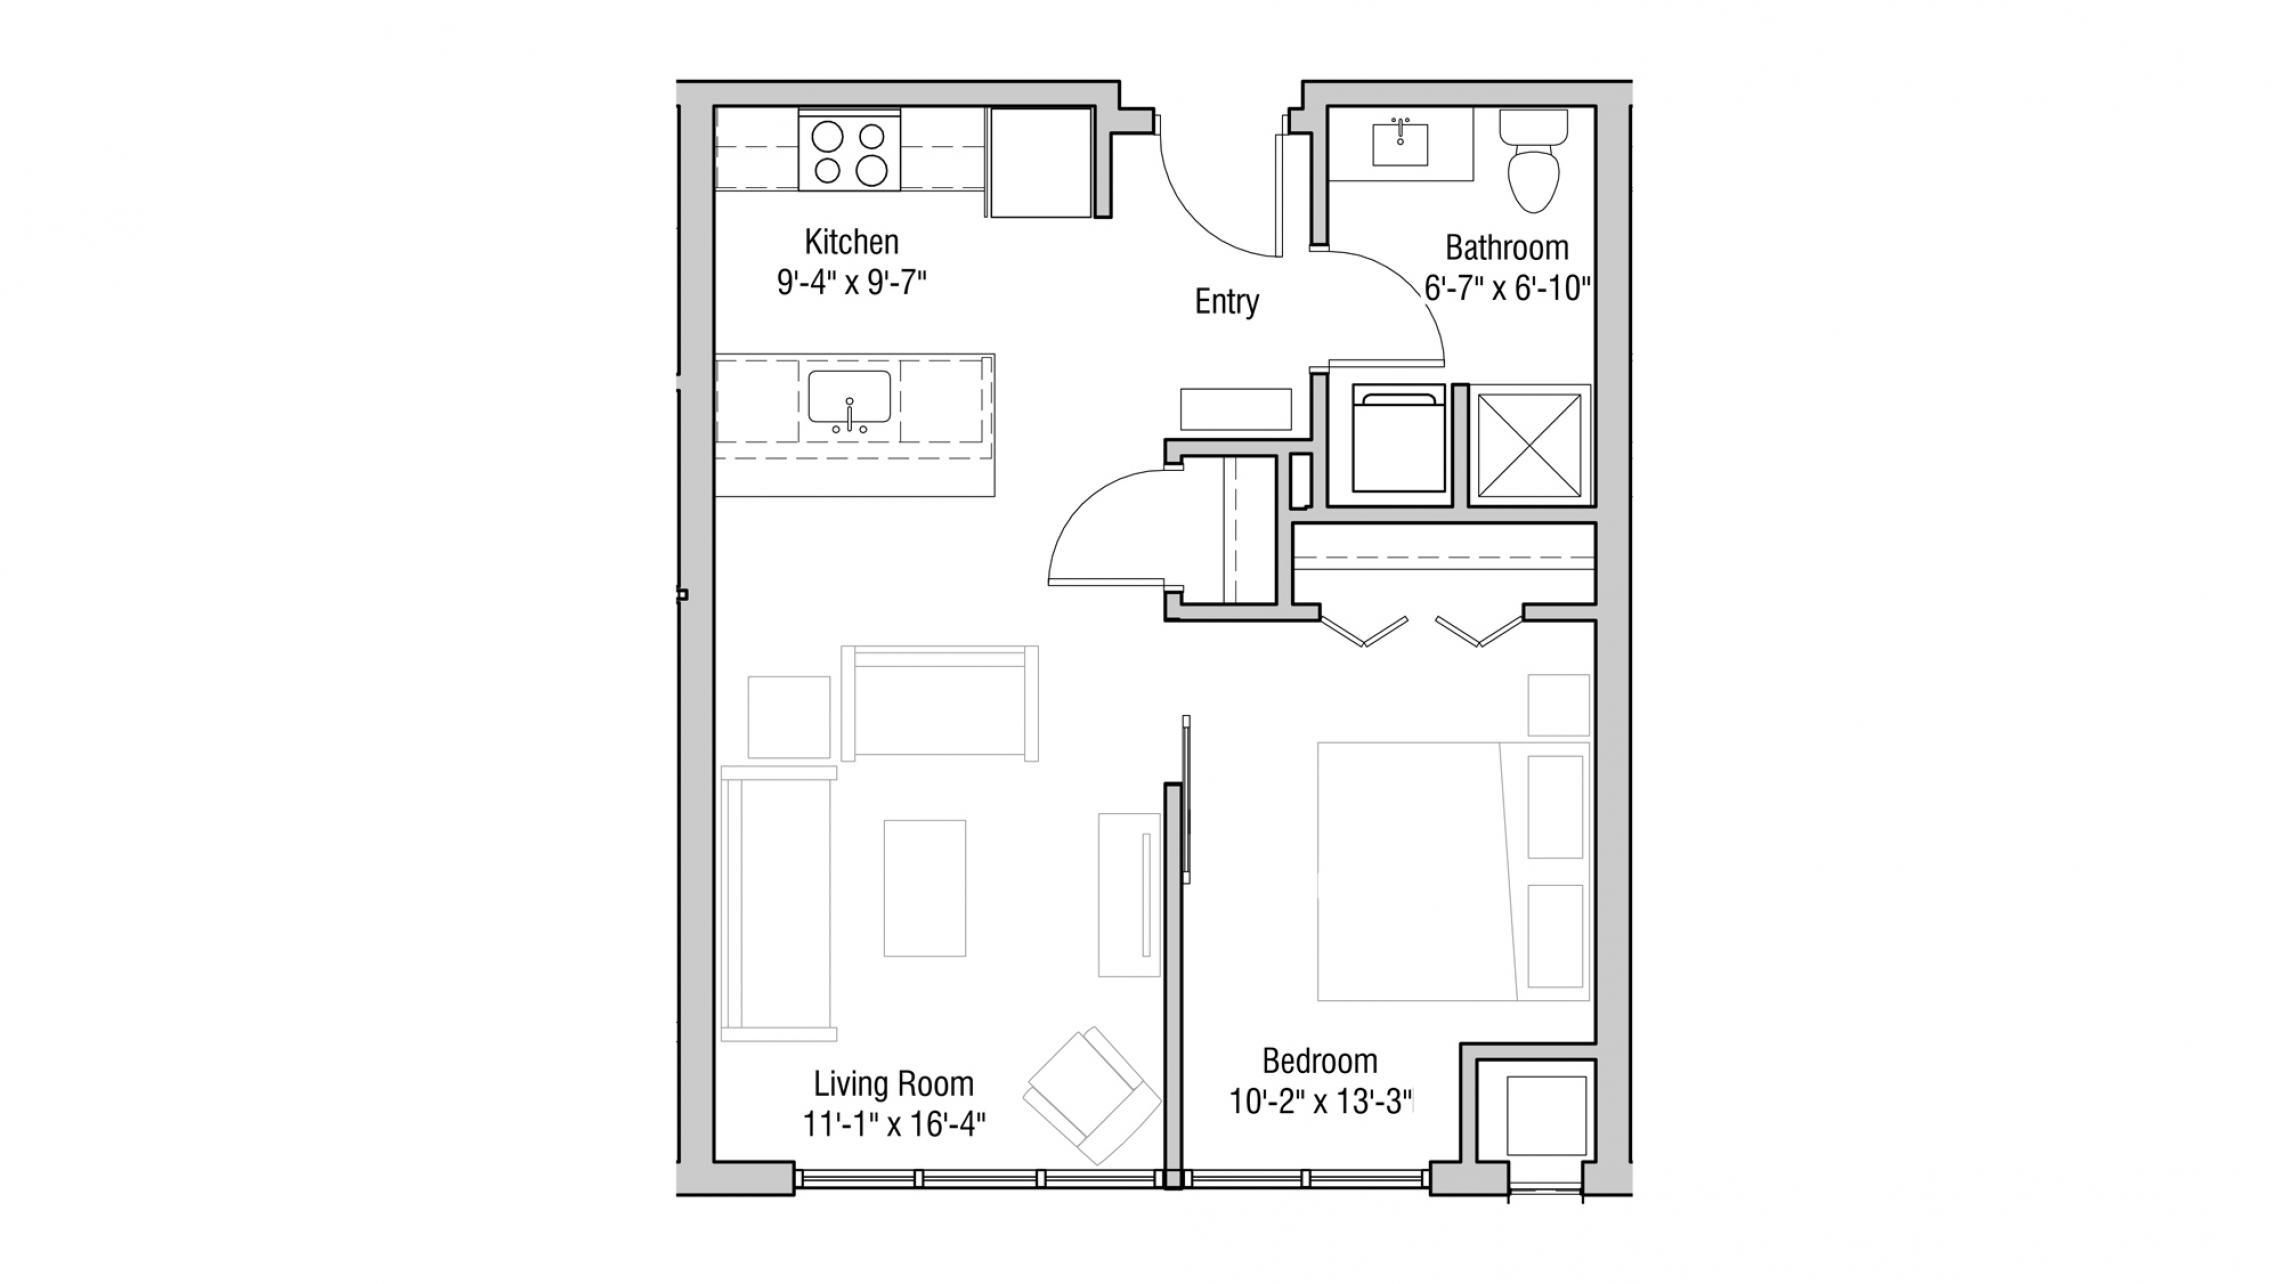 ULI Quarter Row Apartments - Unit 226 - One Bedroom, One Bathroom